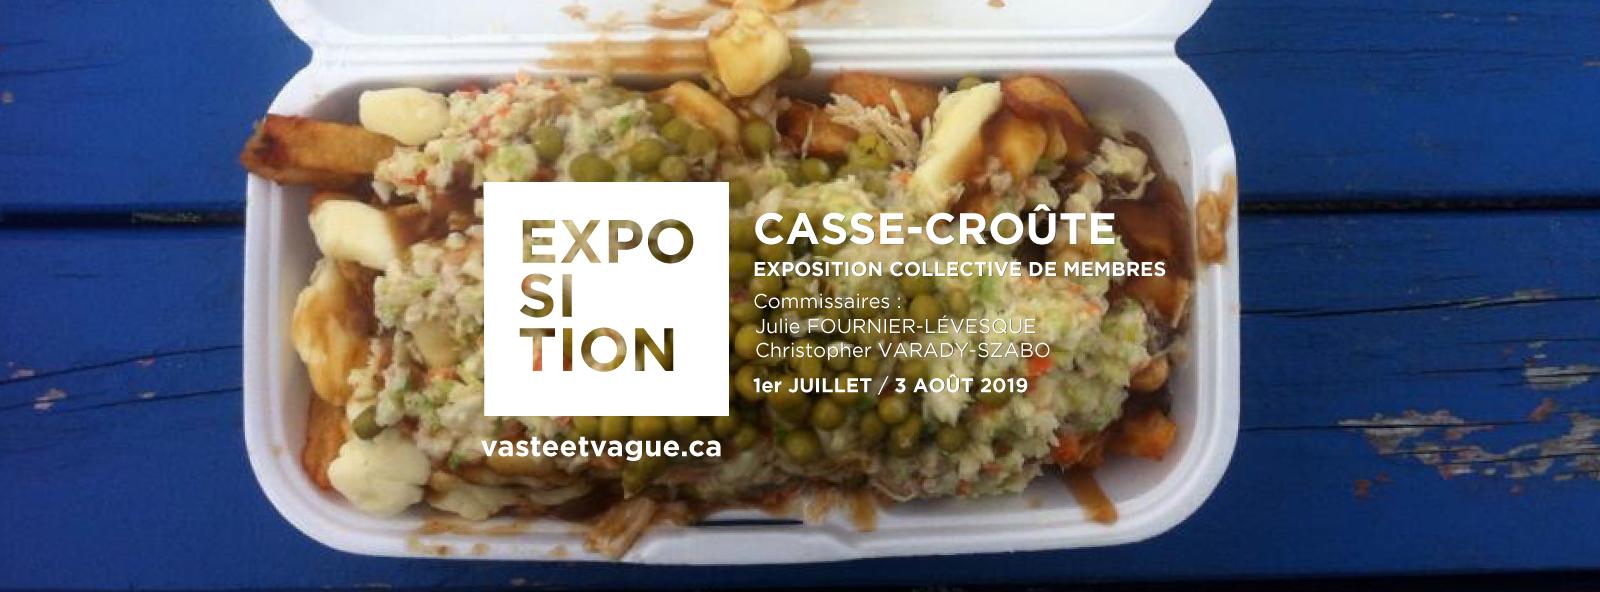 Artistes membres | CASSE-CROÛTE | Exposition collective